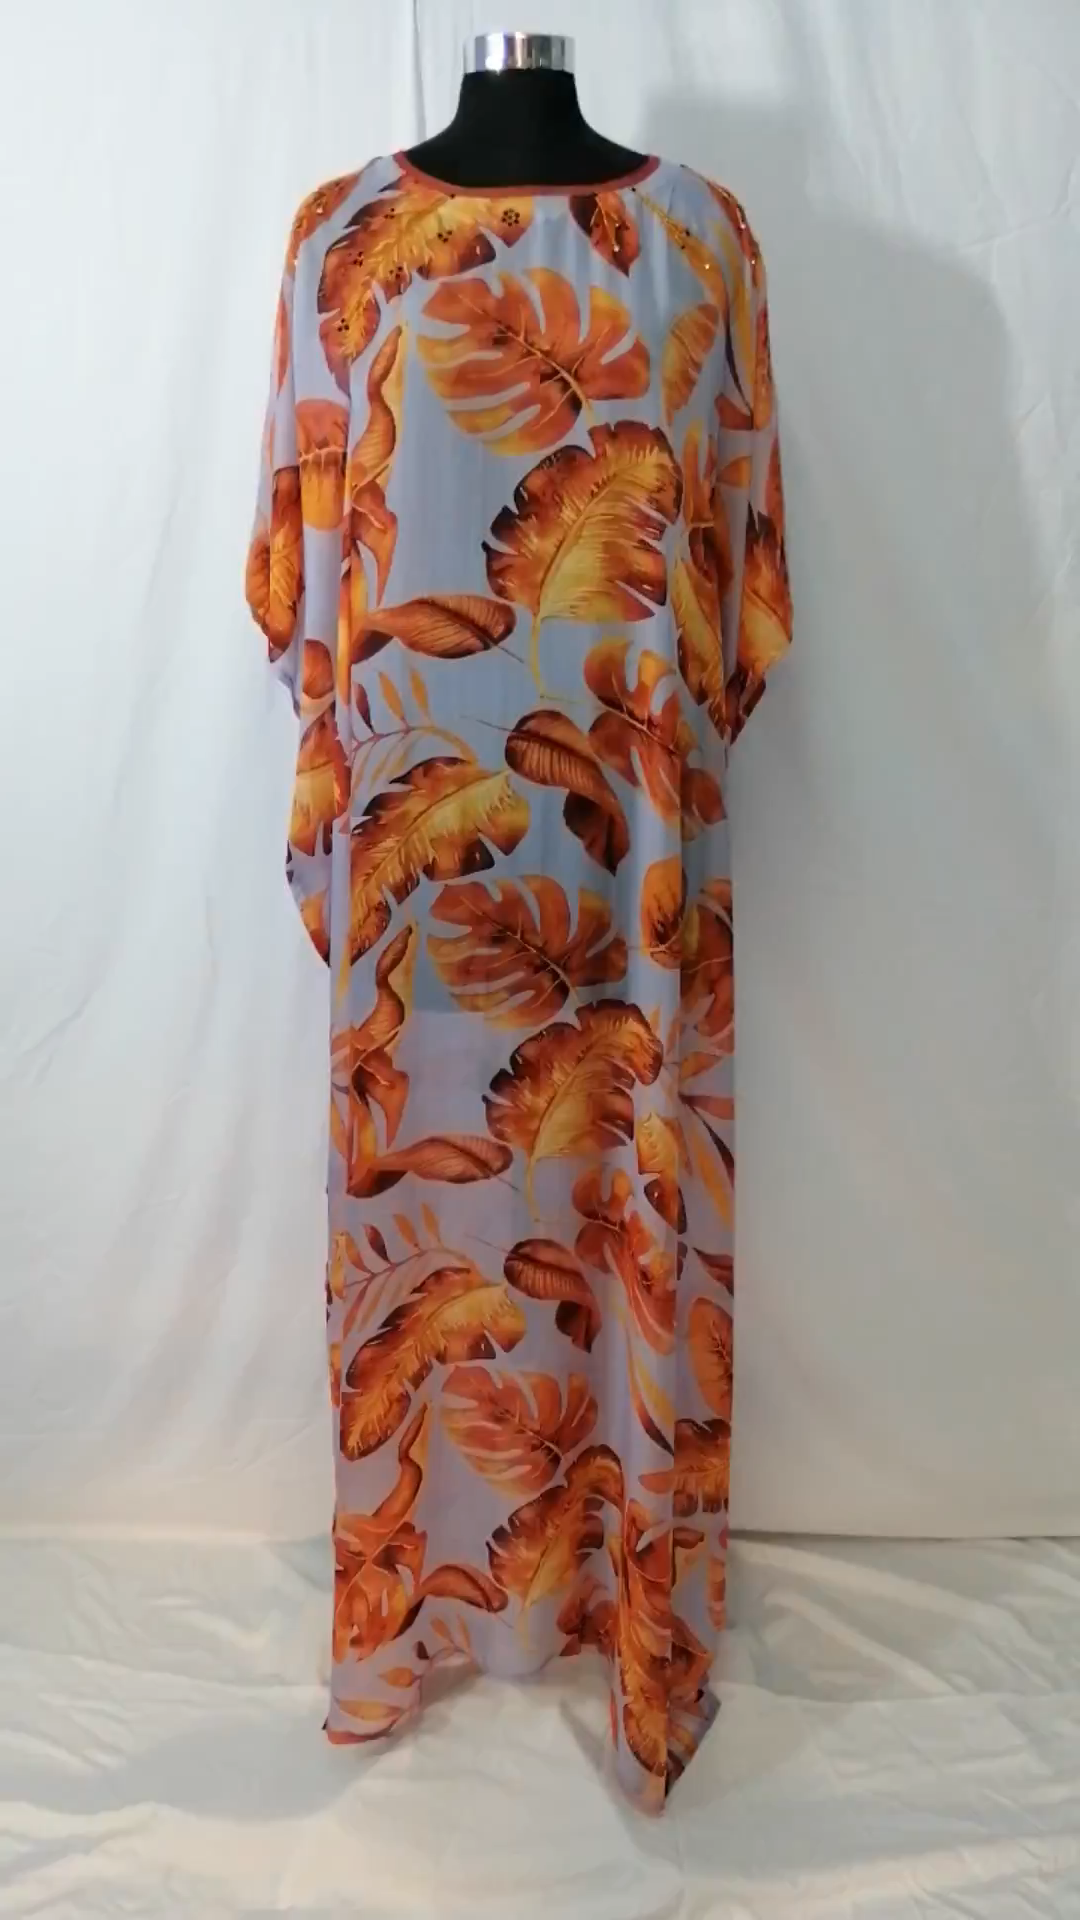 Feather Print designer silk kaftan long beach cover up kaftan dress Plus size sequin kaftan cruise wear caftan resort wear for women 411